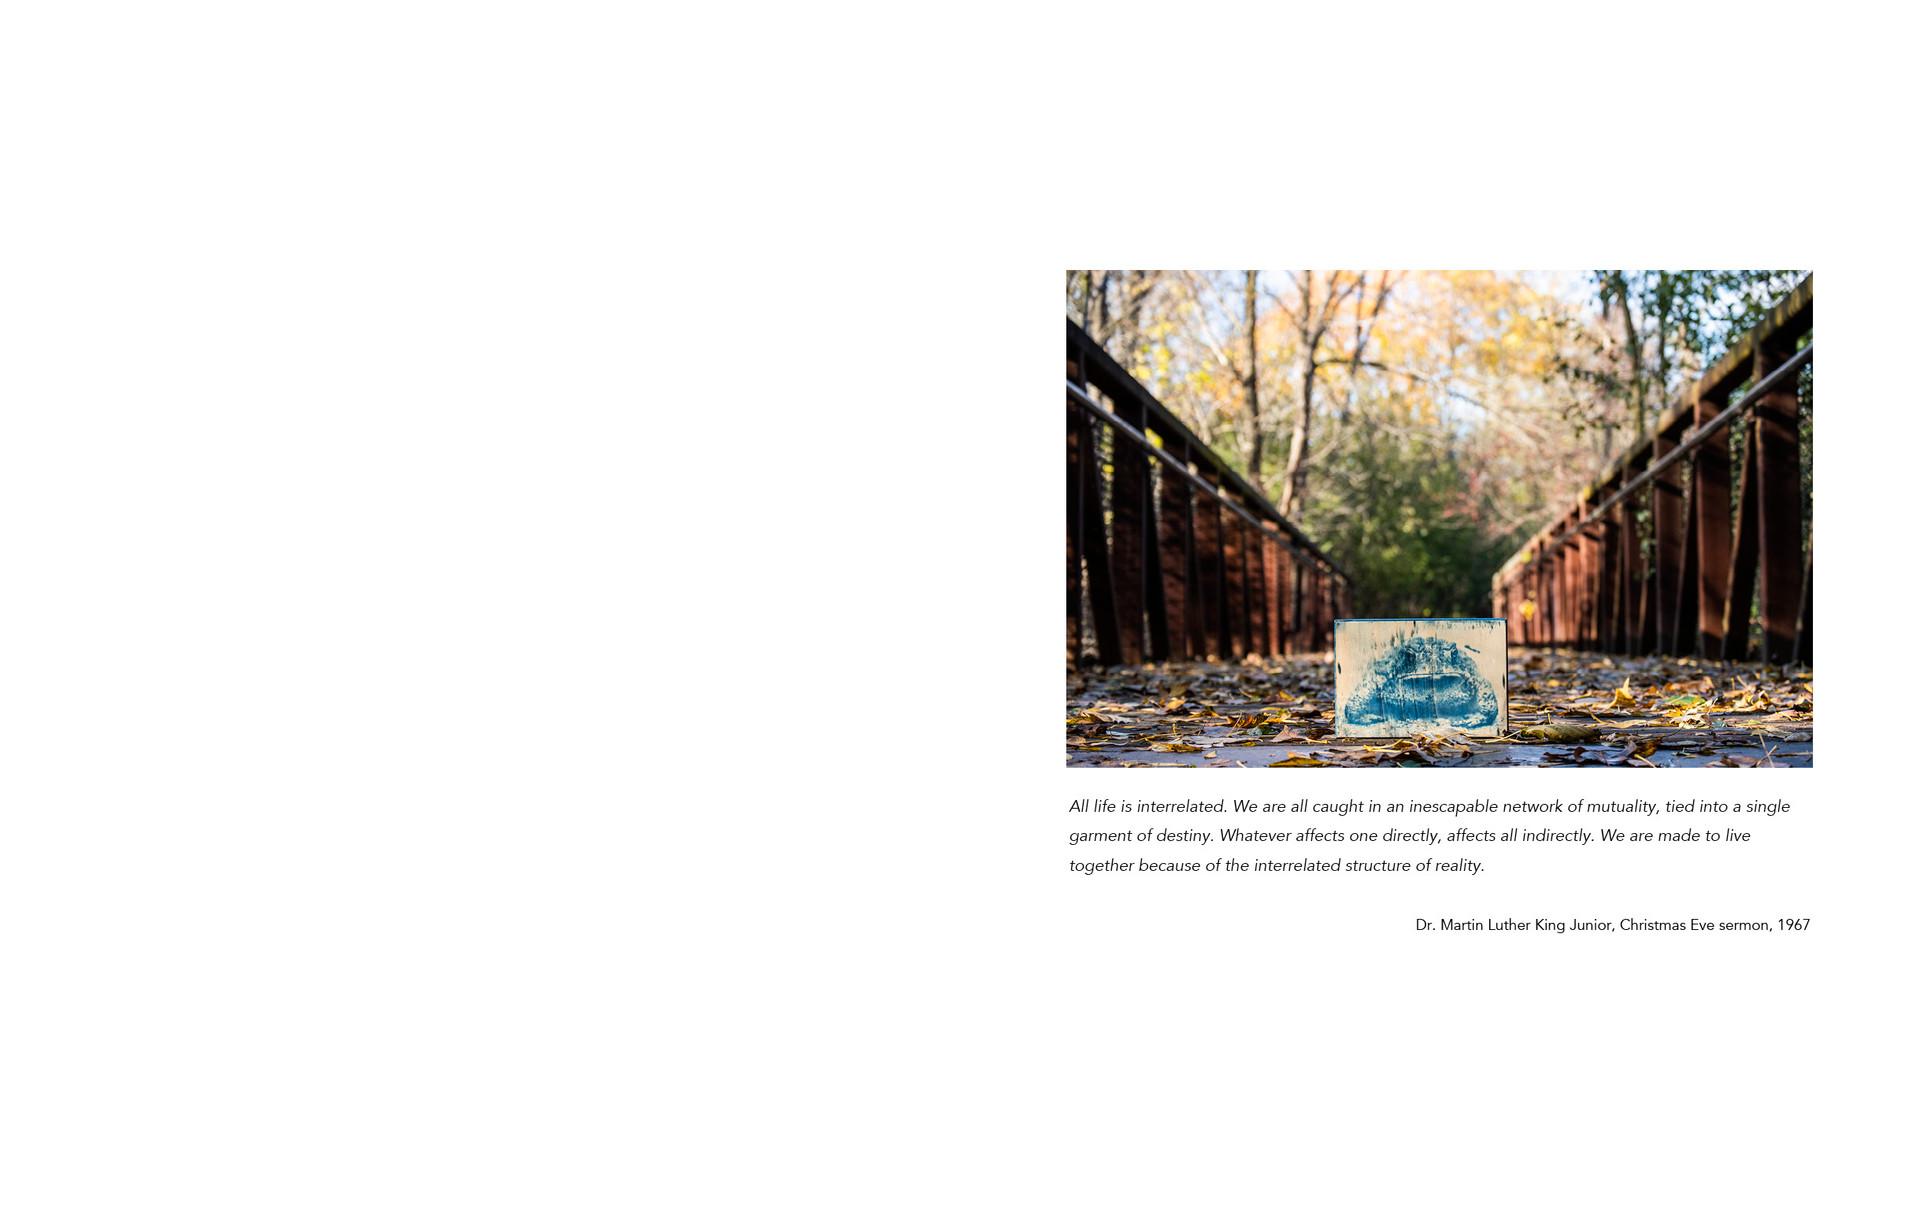 photobookwebsite4.jpg